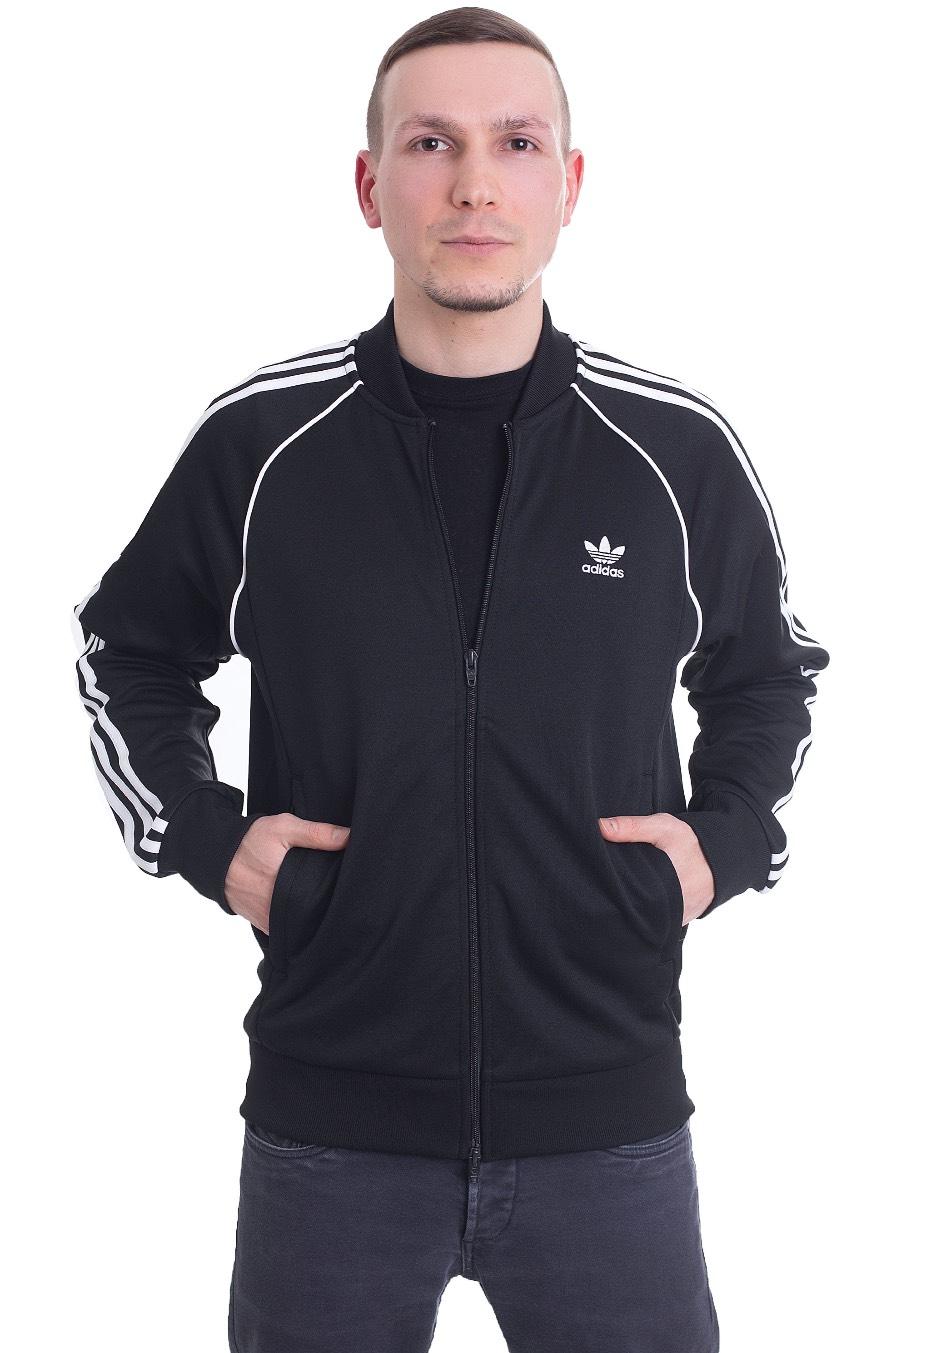 fd3cb0d33687c Adidas - SST Black - Track Jacket - Streetwear Shop - Impericon.com  Worldwide